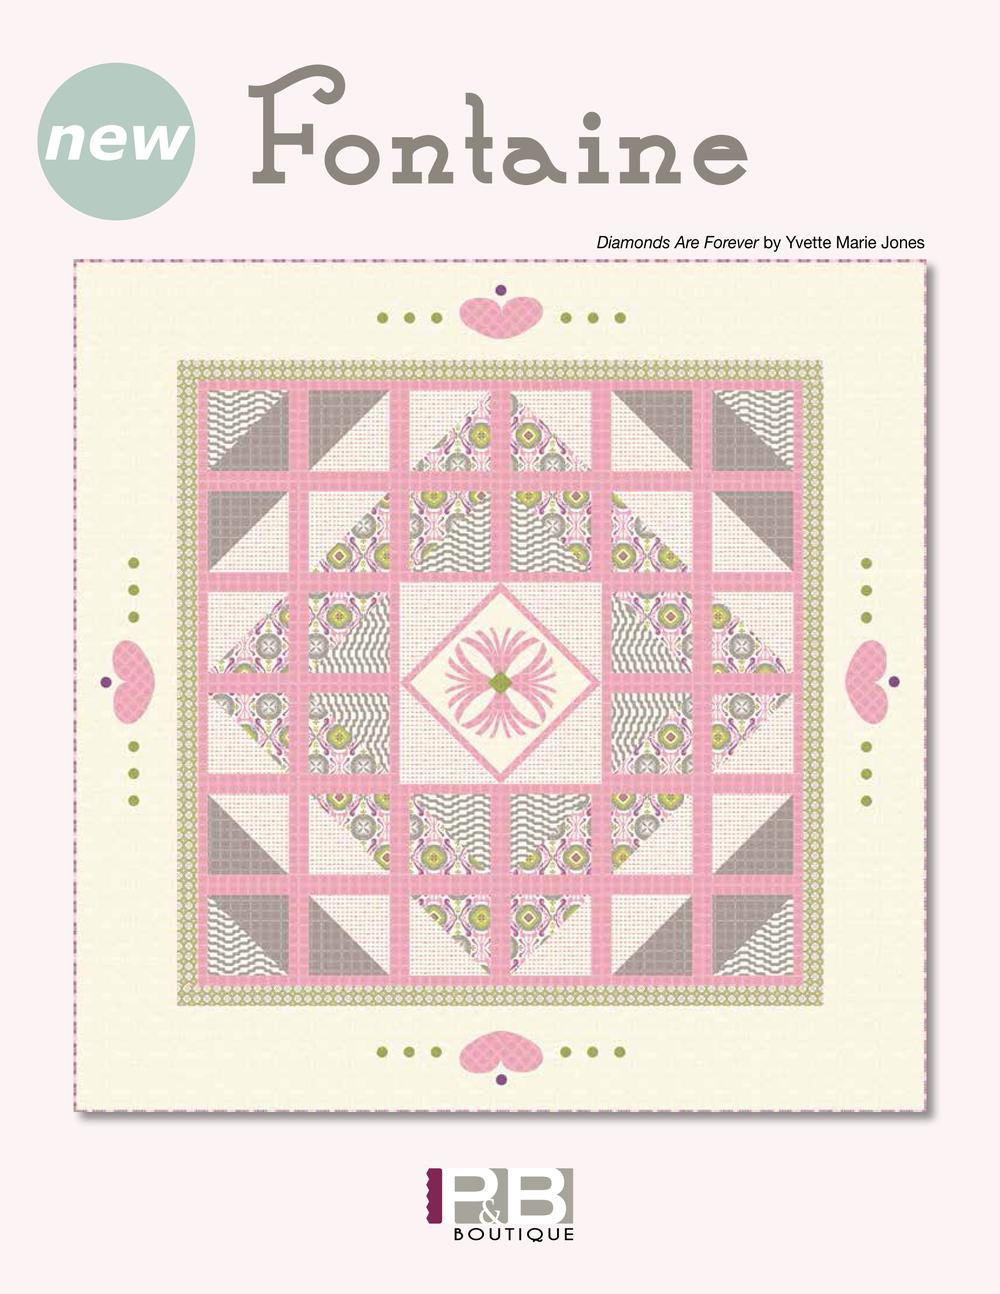 Diamond Are Forever by: Yvette Marie Jones Fontaine